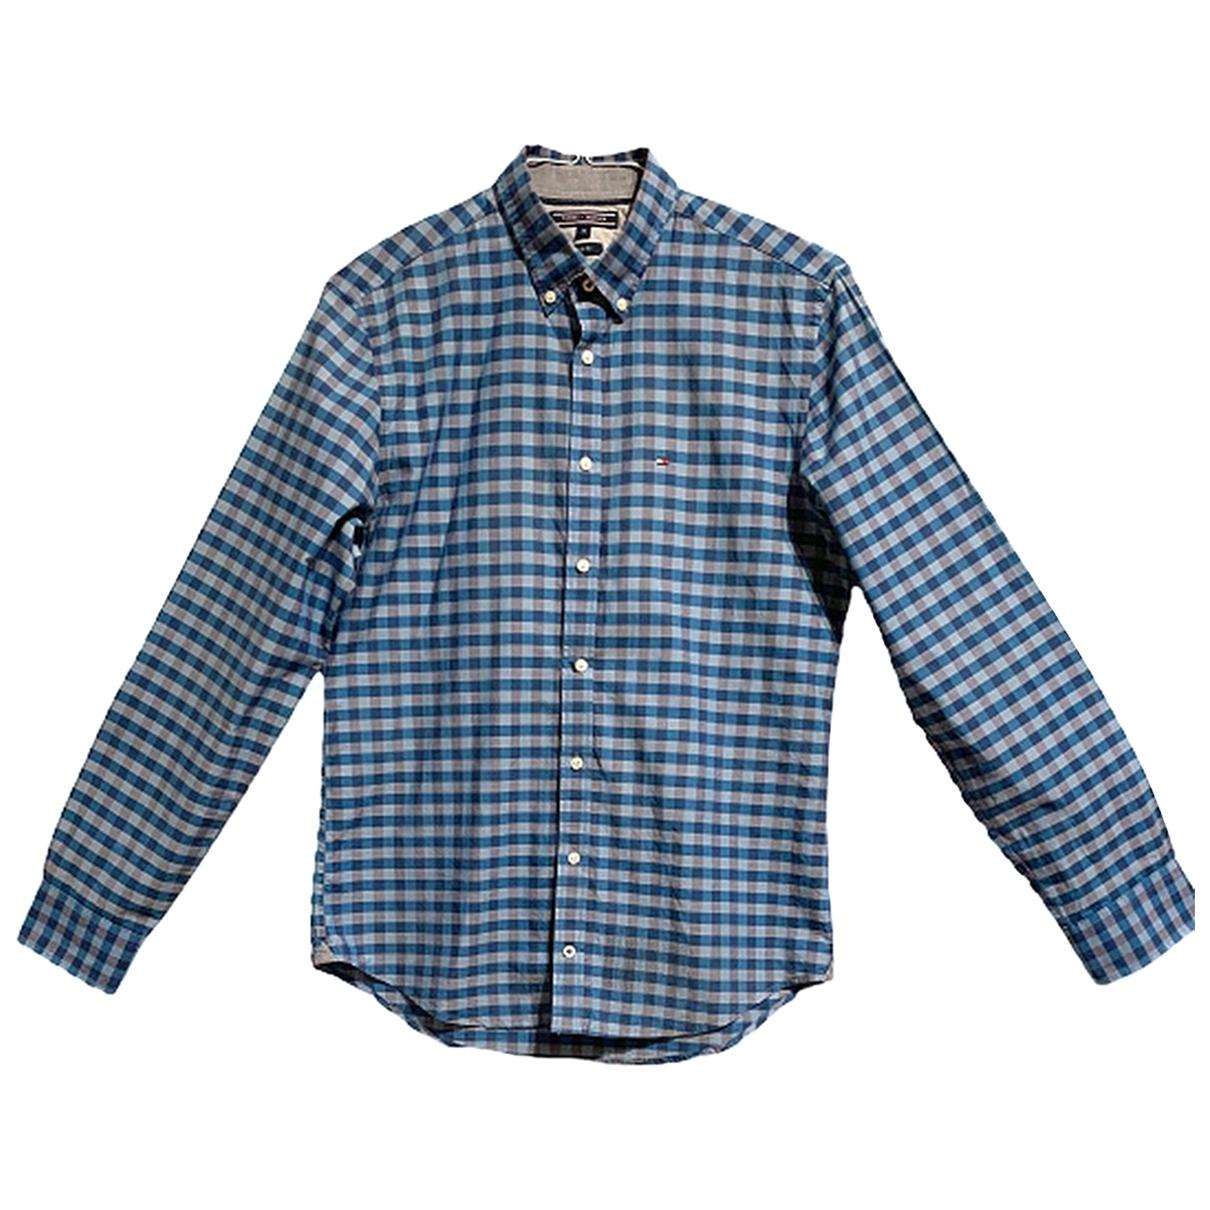 Tommy Hilfiger N Multicolour Cotton Shirts for Men M International